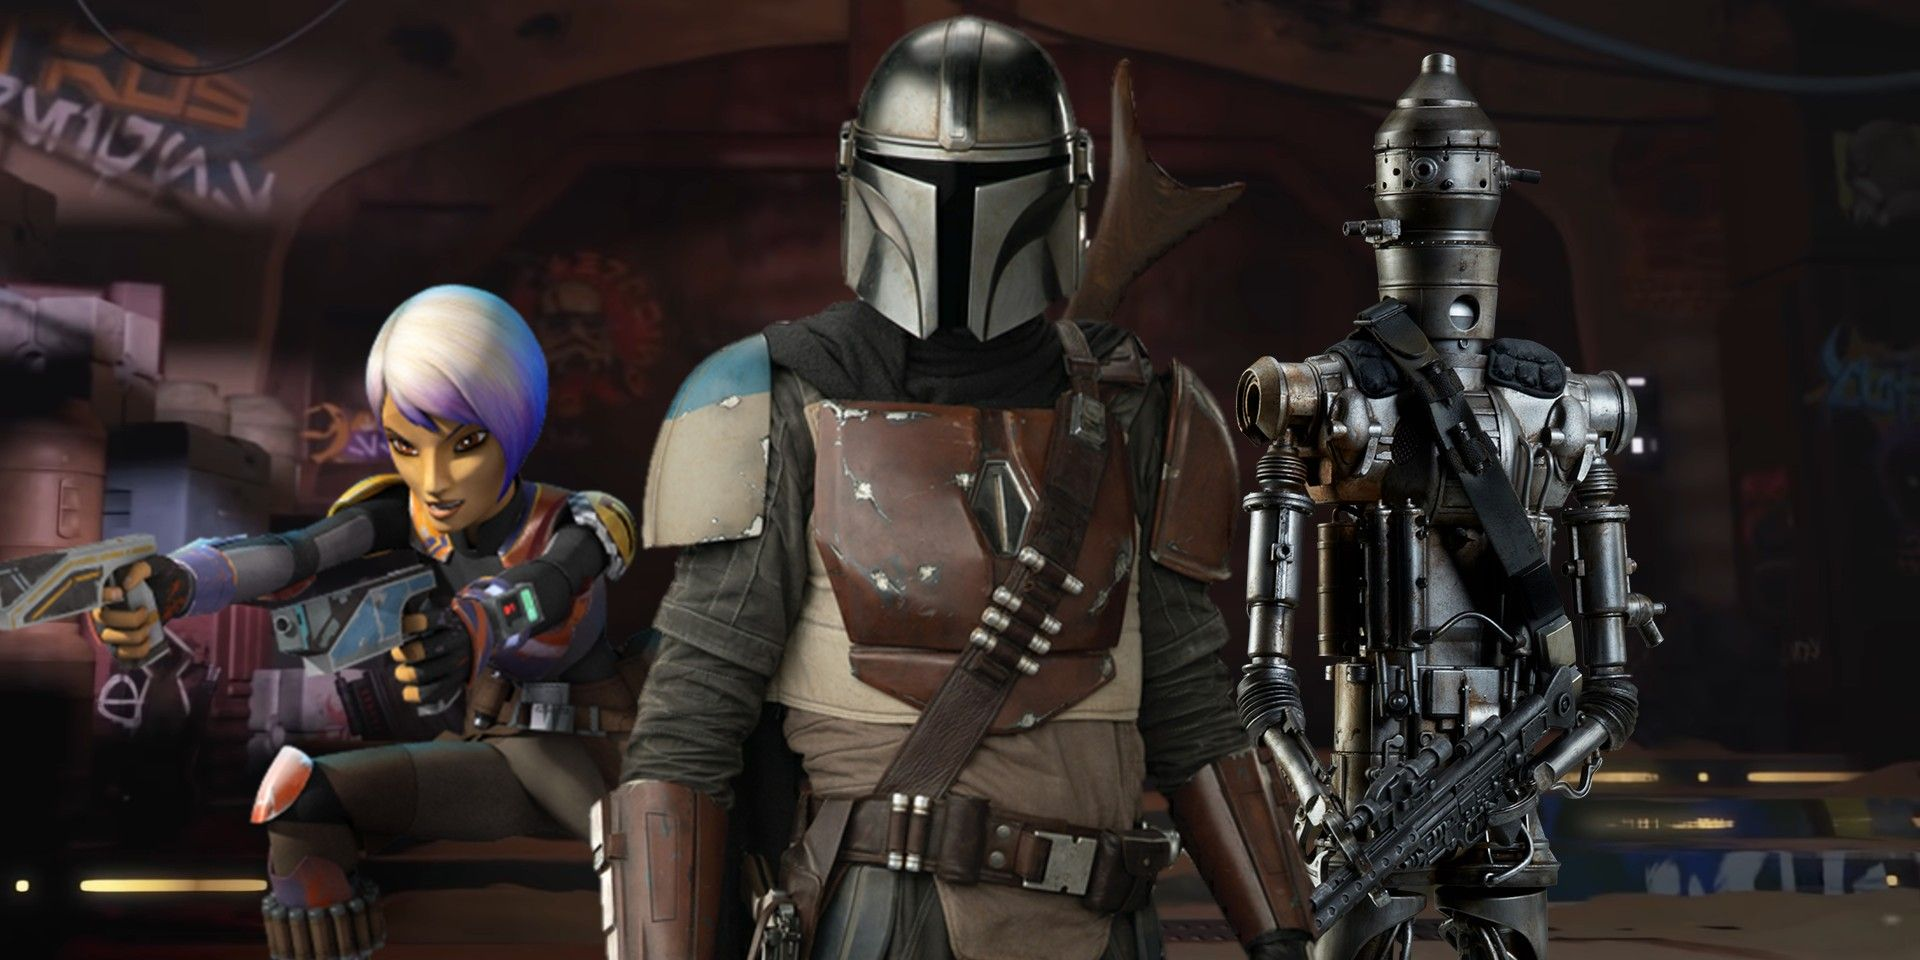 Zynga e Lucasfilm Games anunciam Star Wars: Hunters para Nintendo Switch